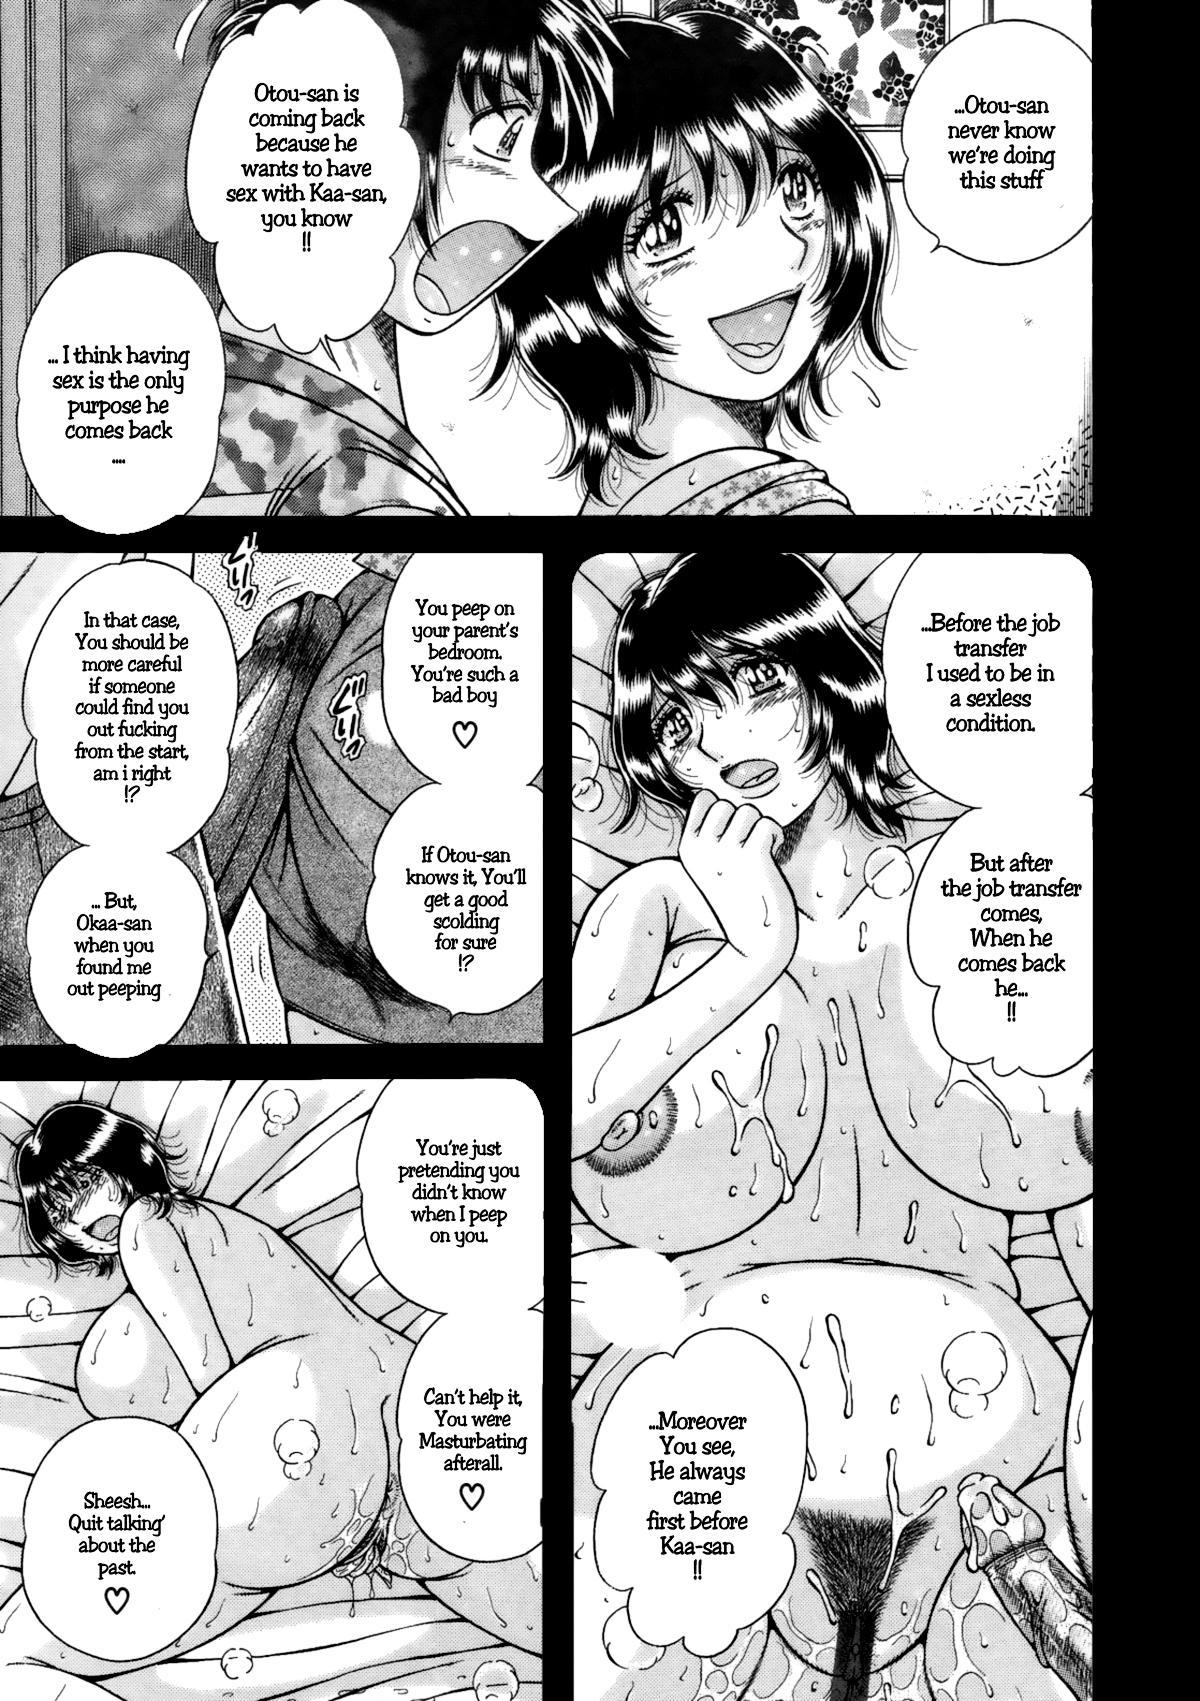 Jukubo Yuugi - Itoshii Hito Chapter 1 + 2 + 3 24